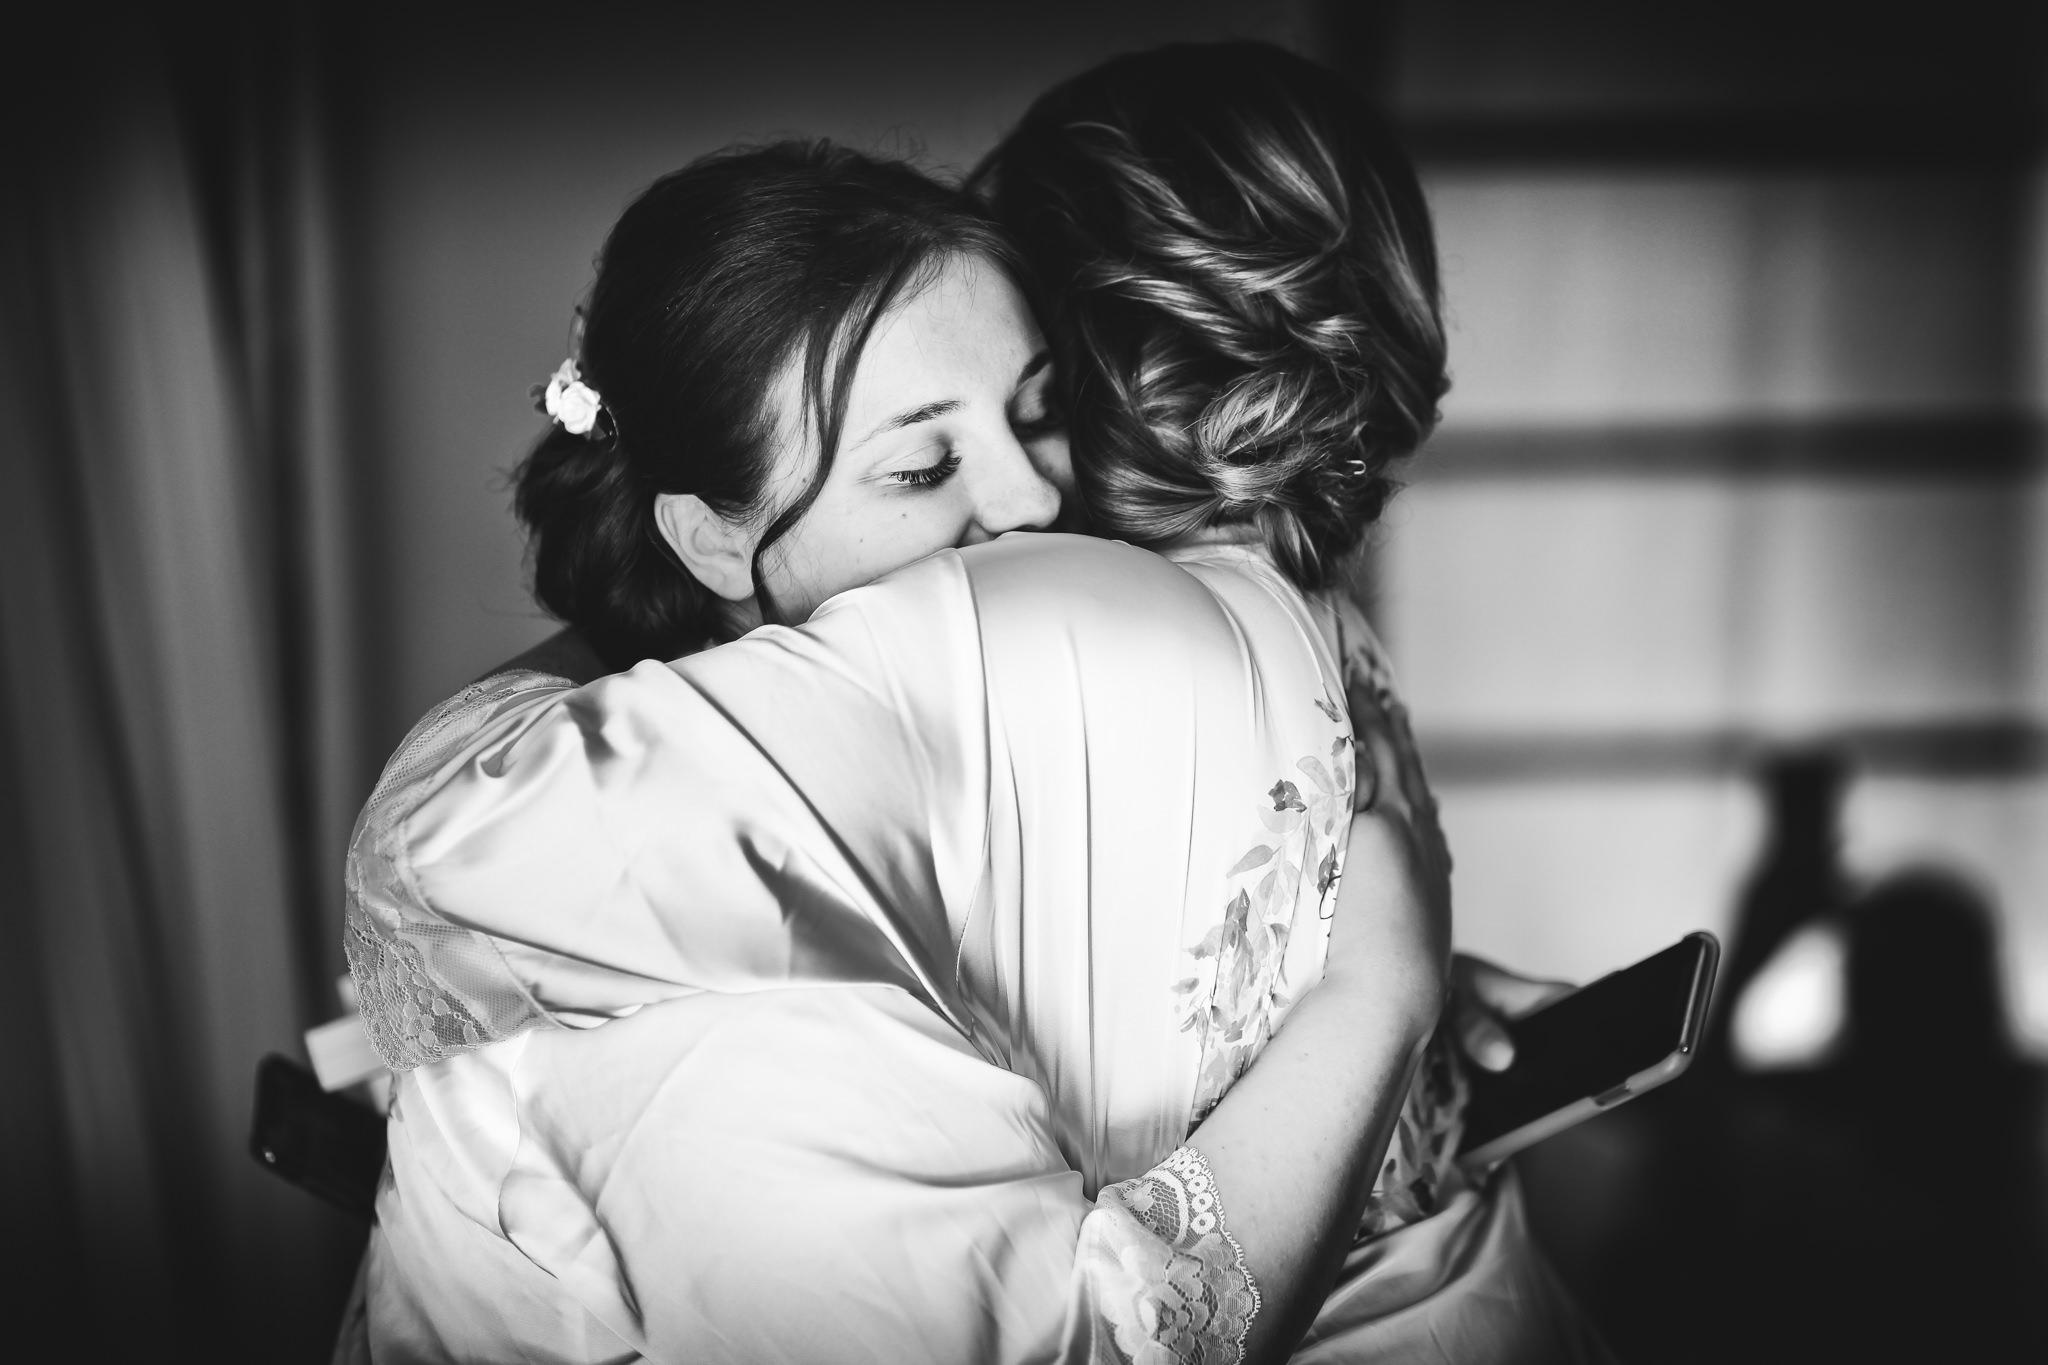 007-2019-04-27-Wedding-Michelle-e-Callum-85mm-056-Edit